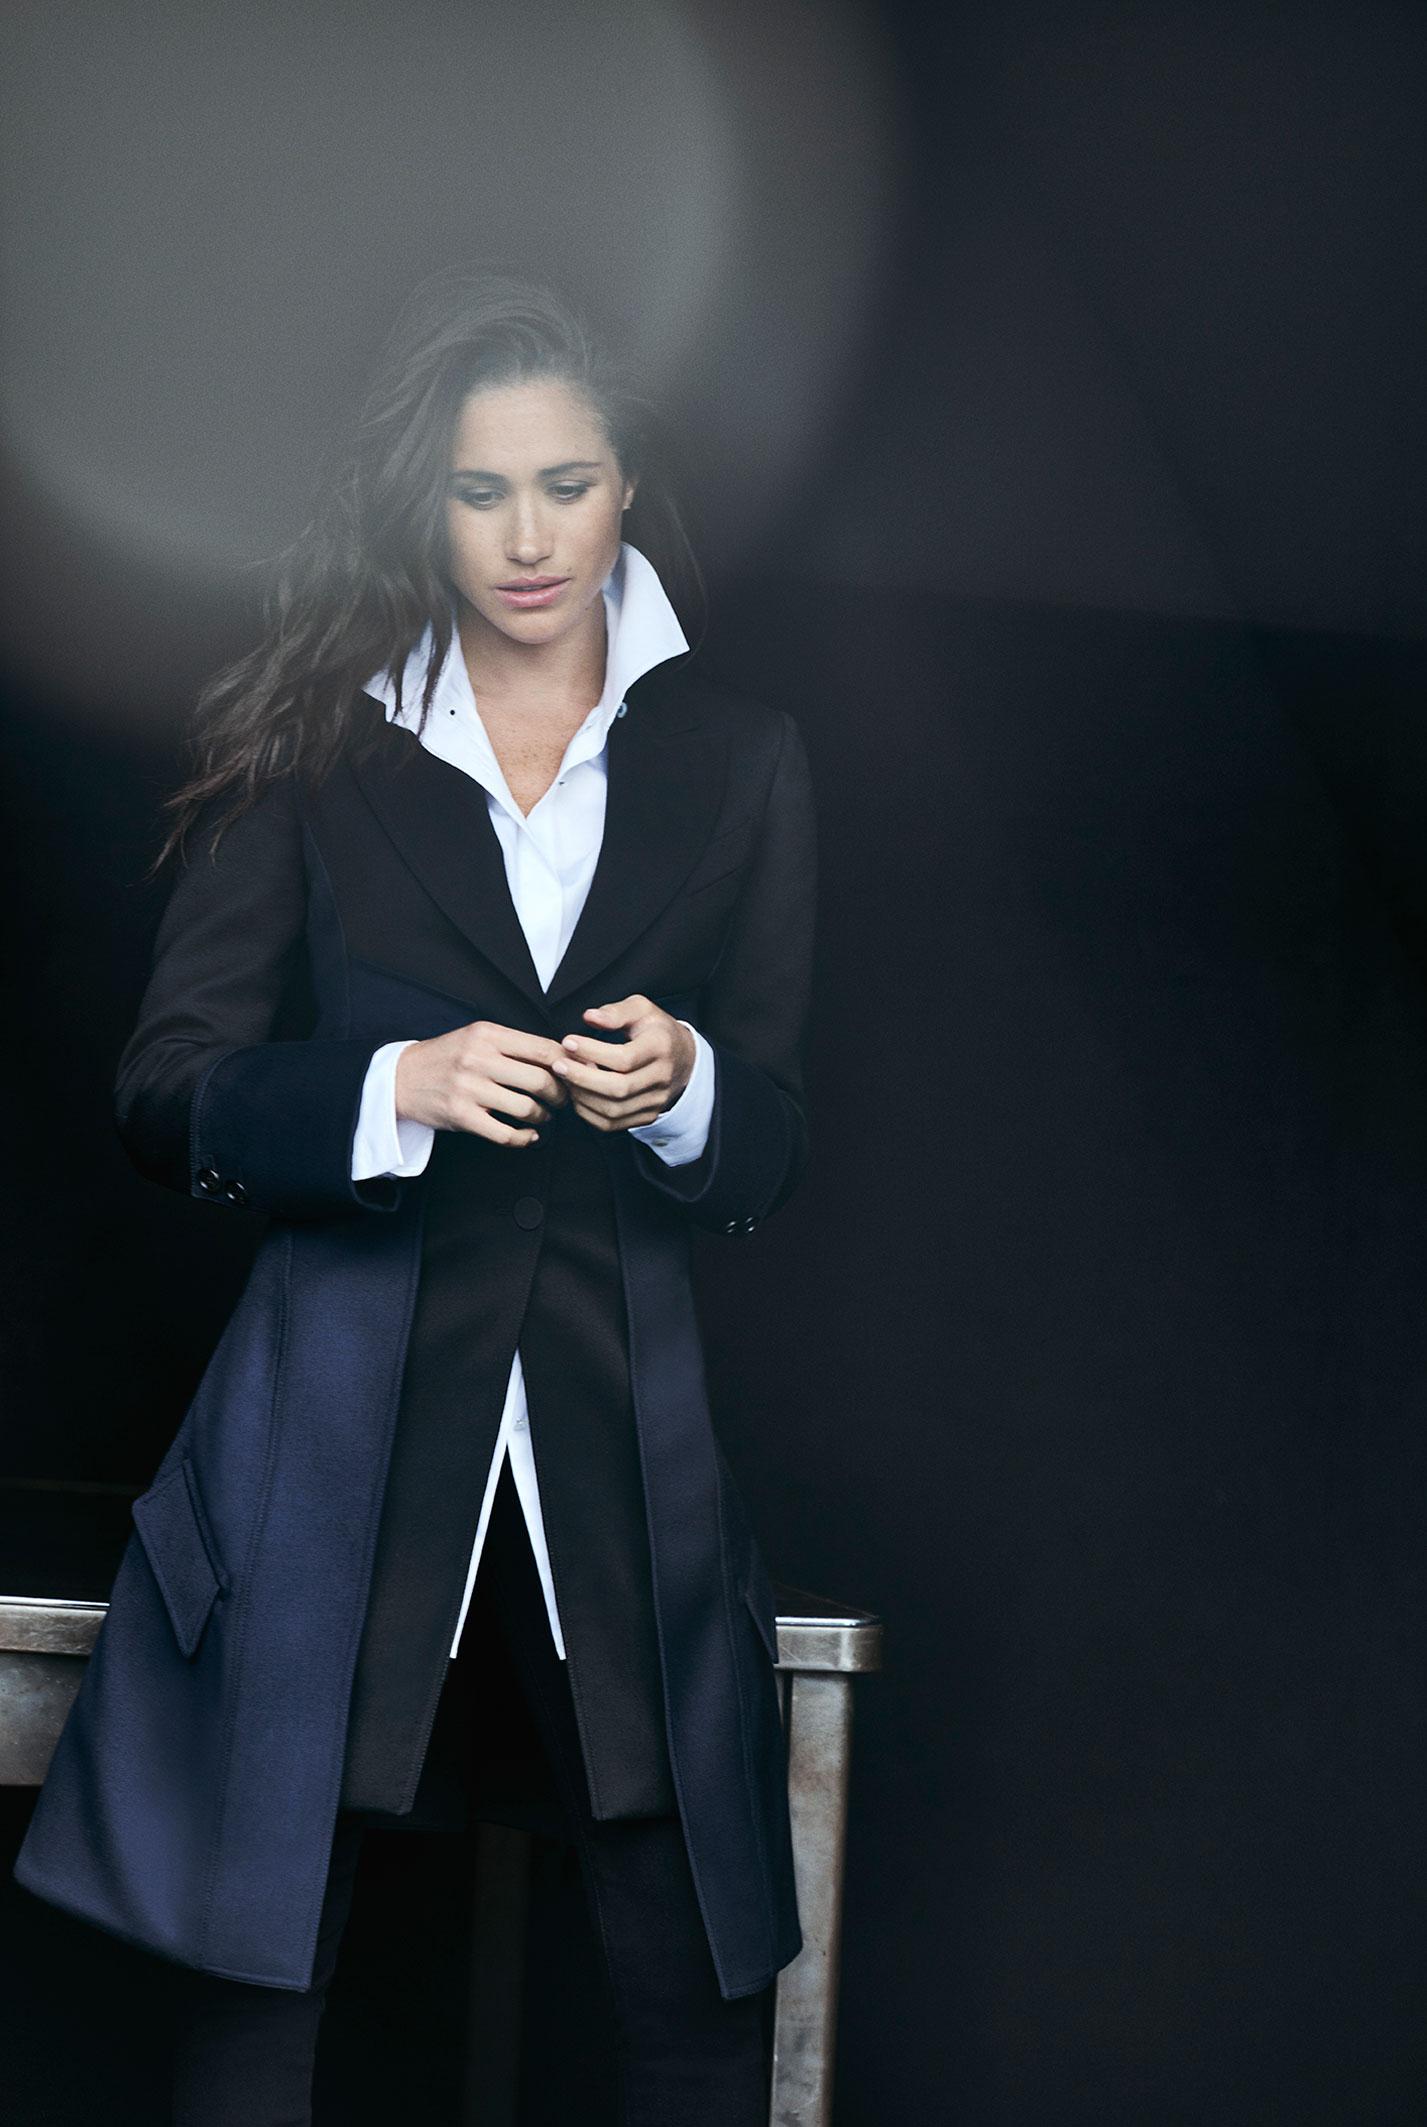 Меган Маркл на страницах журнала Vanity Fair / фото 05